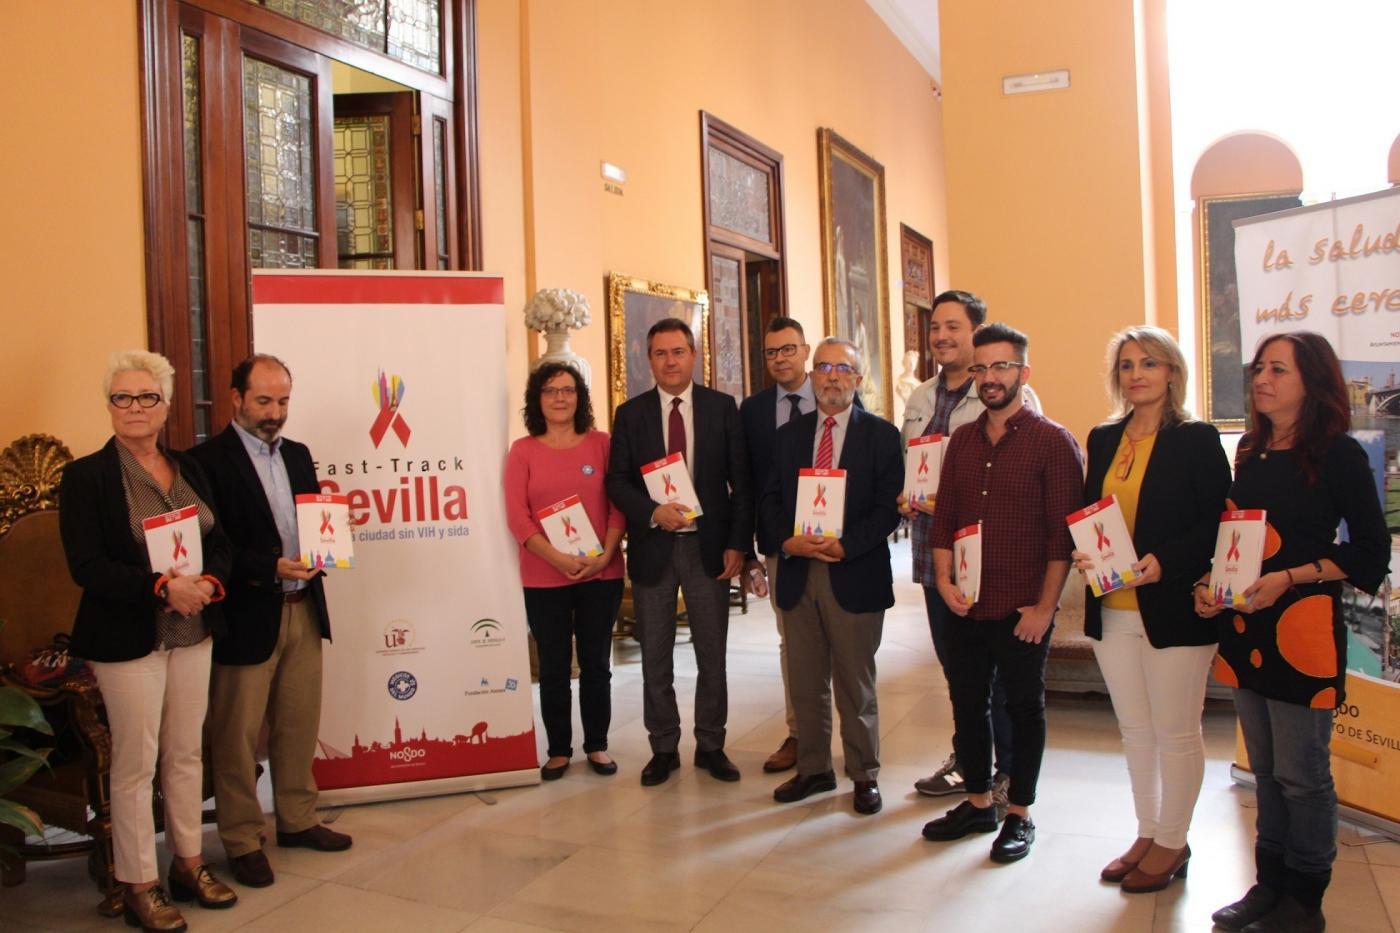 Sevilla acoge la Conferencia Mundial Fast Track de lucha contra el VIH Sida